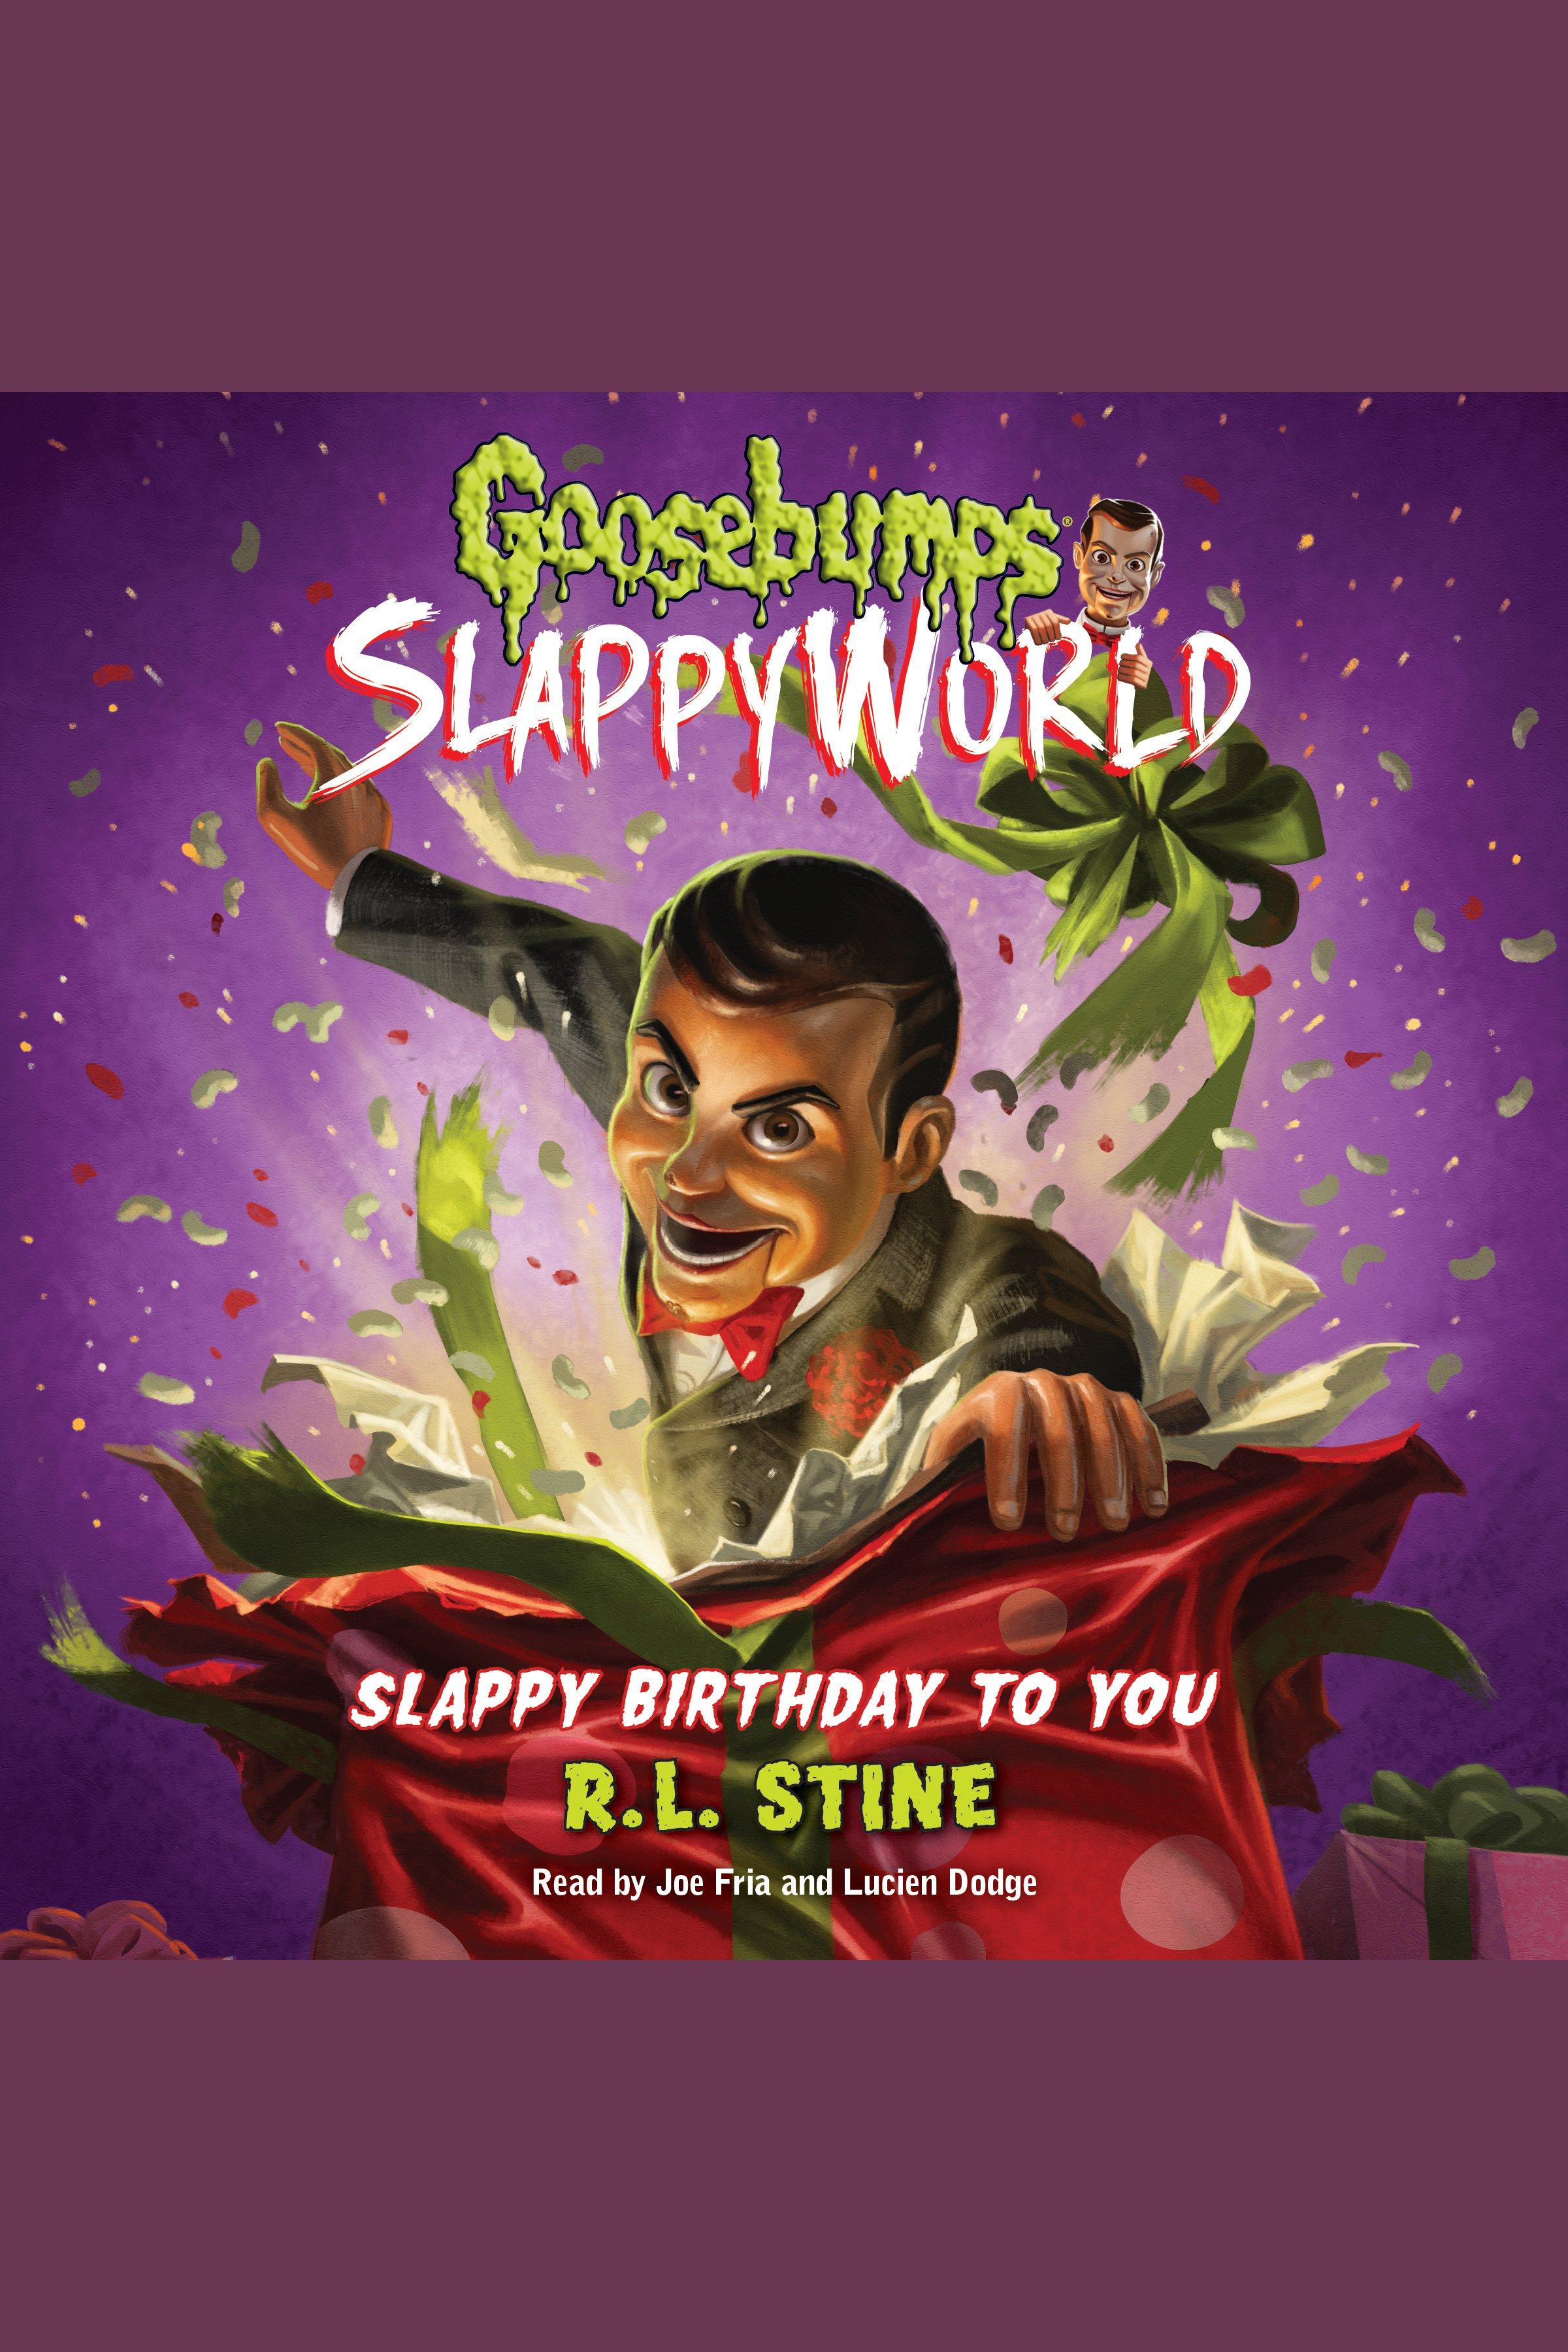 Slappy birthday to you cover image